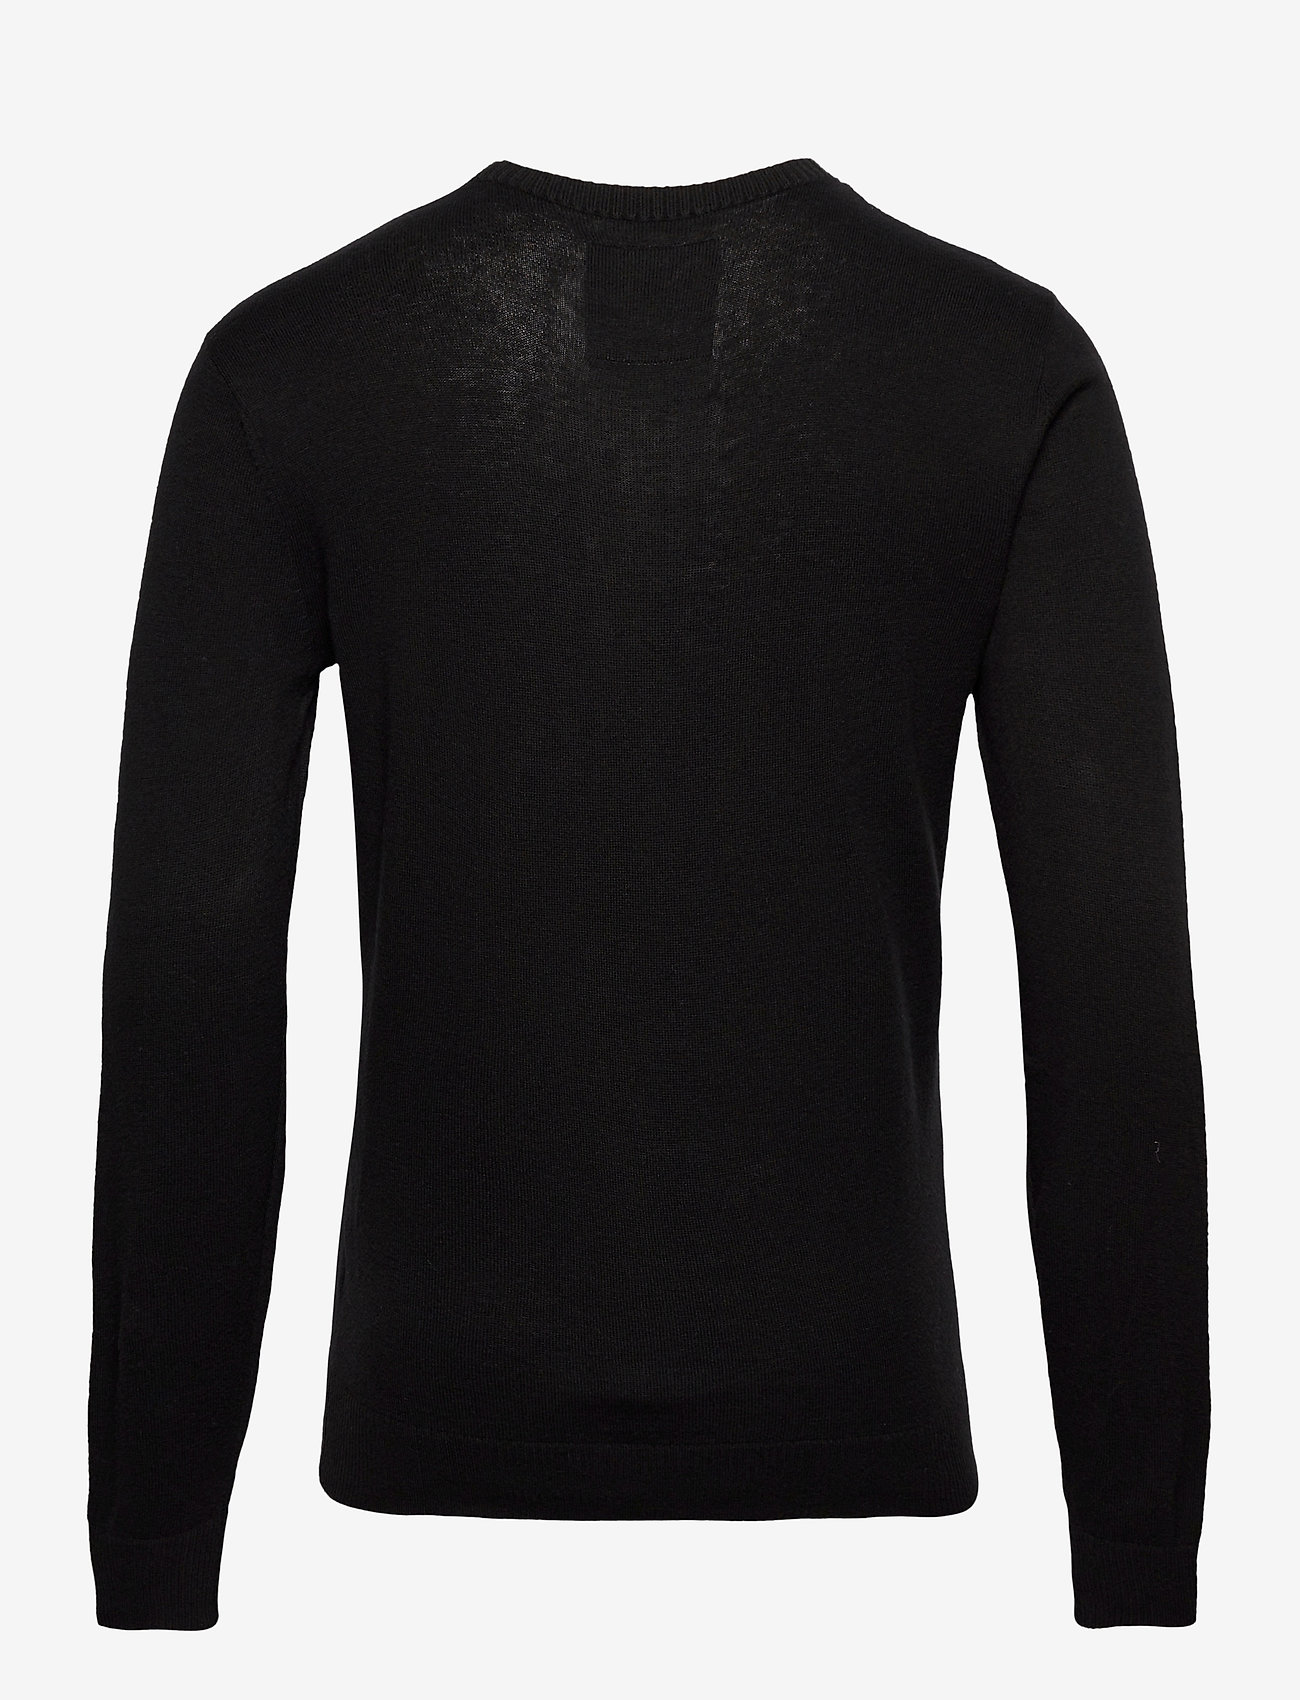 Hco. Guys Sweaters (Black Dd) (29.25 €) - Hollister q3Mai